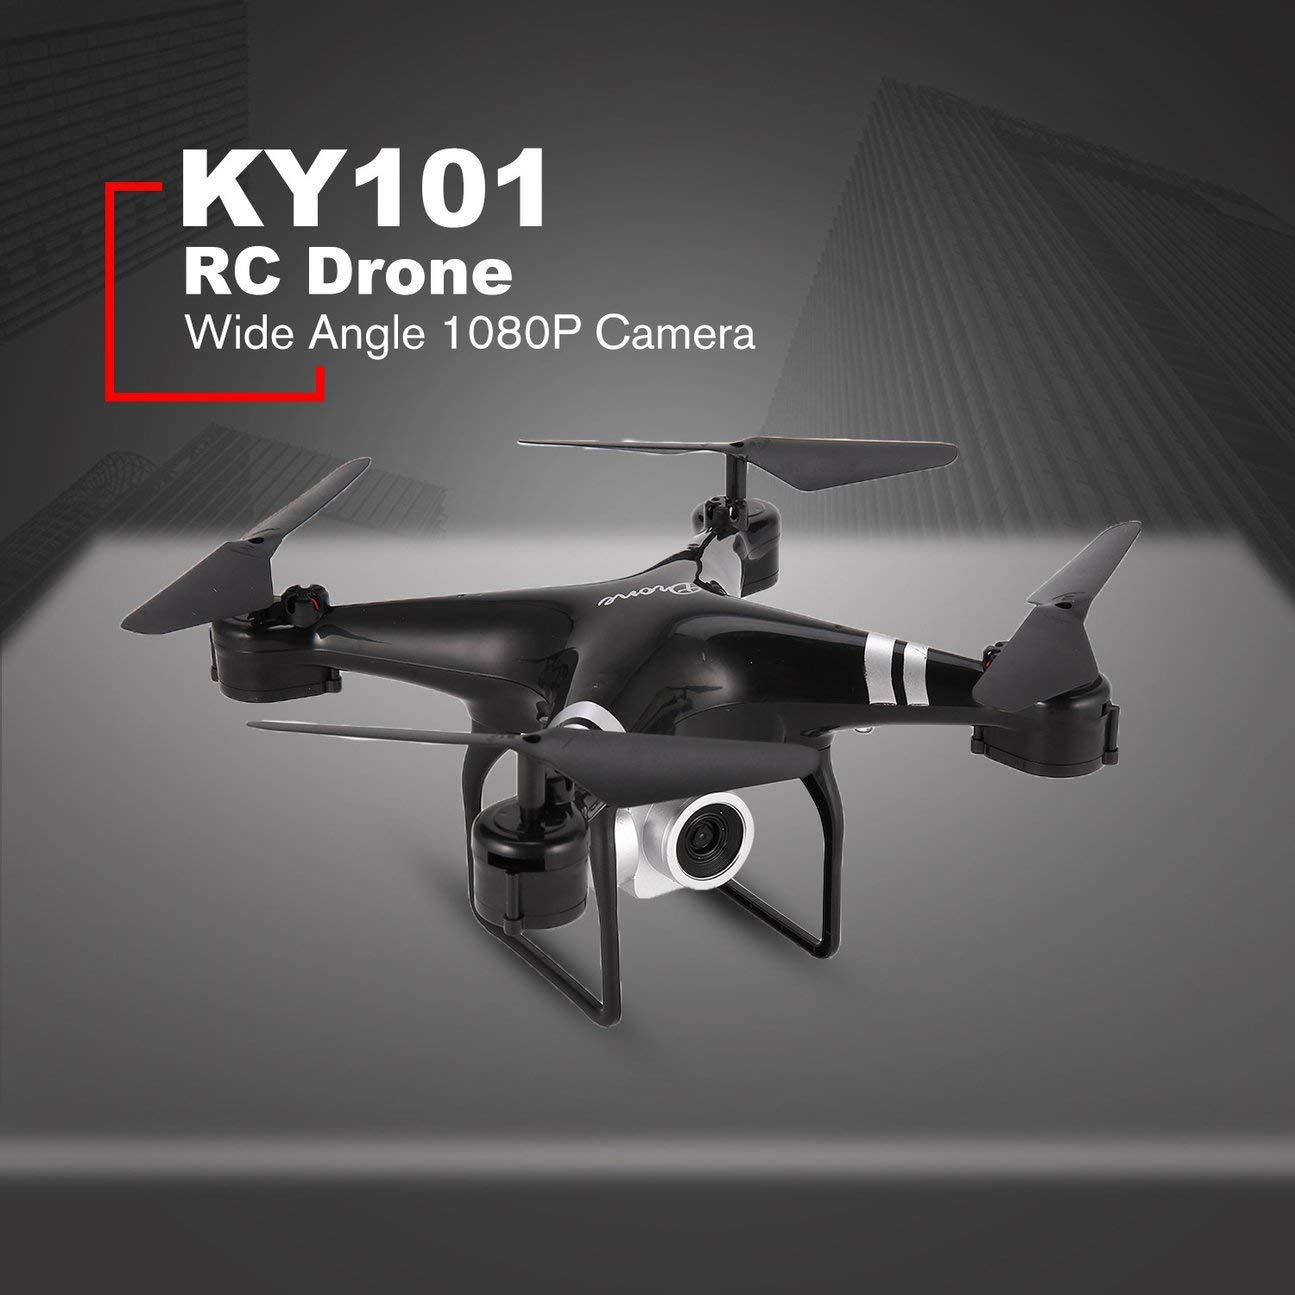 KY101S WiFi FPV Cámara Gran Angular 1080P 1080P 1080P Selfie RC Drone Altitud Mantener Modo sin Cabeza Volteres 3D One Key Return Quadcopter 18 Min. Negro 3cacc0